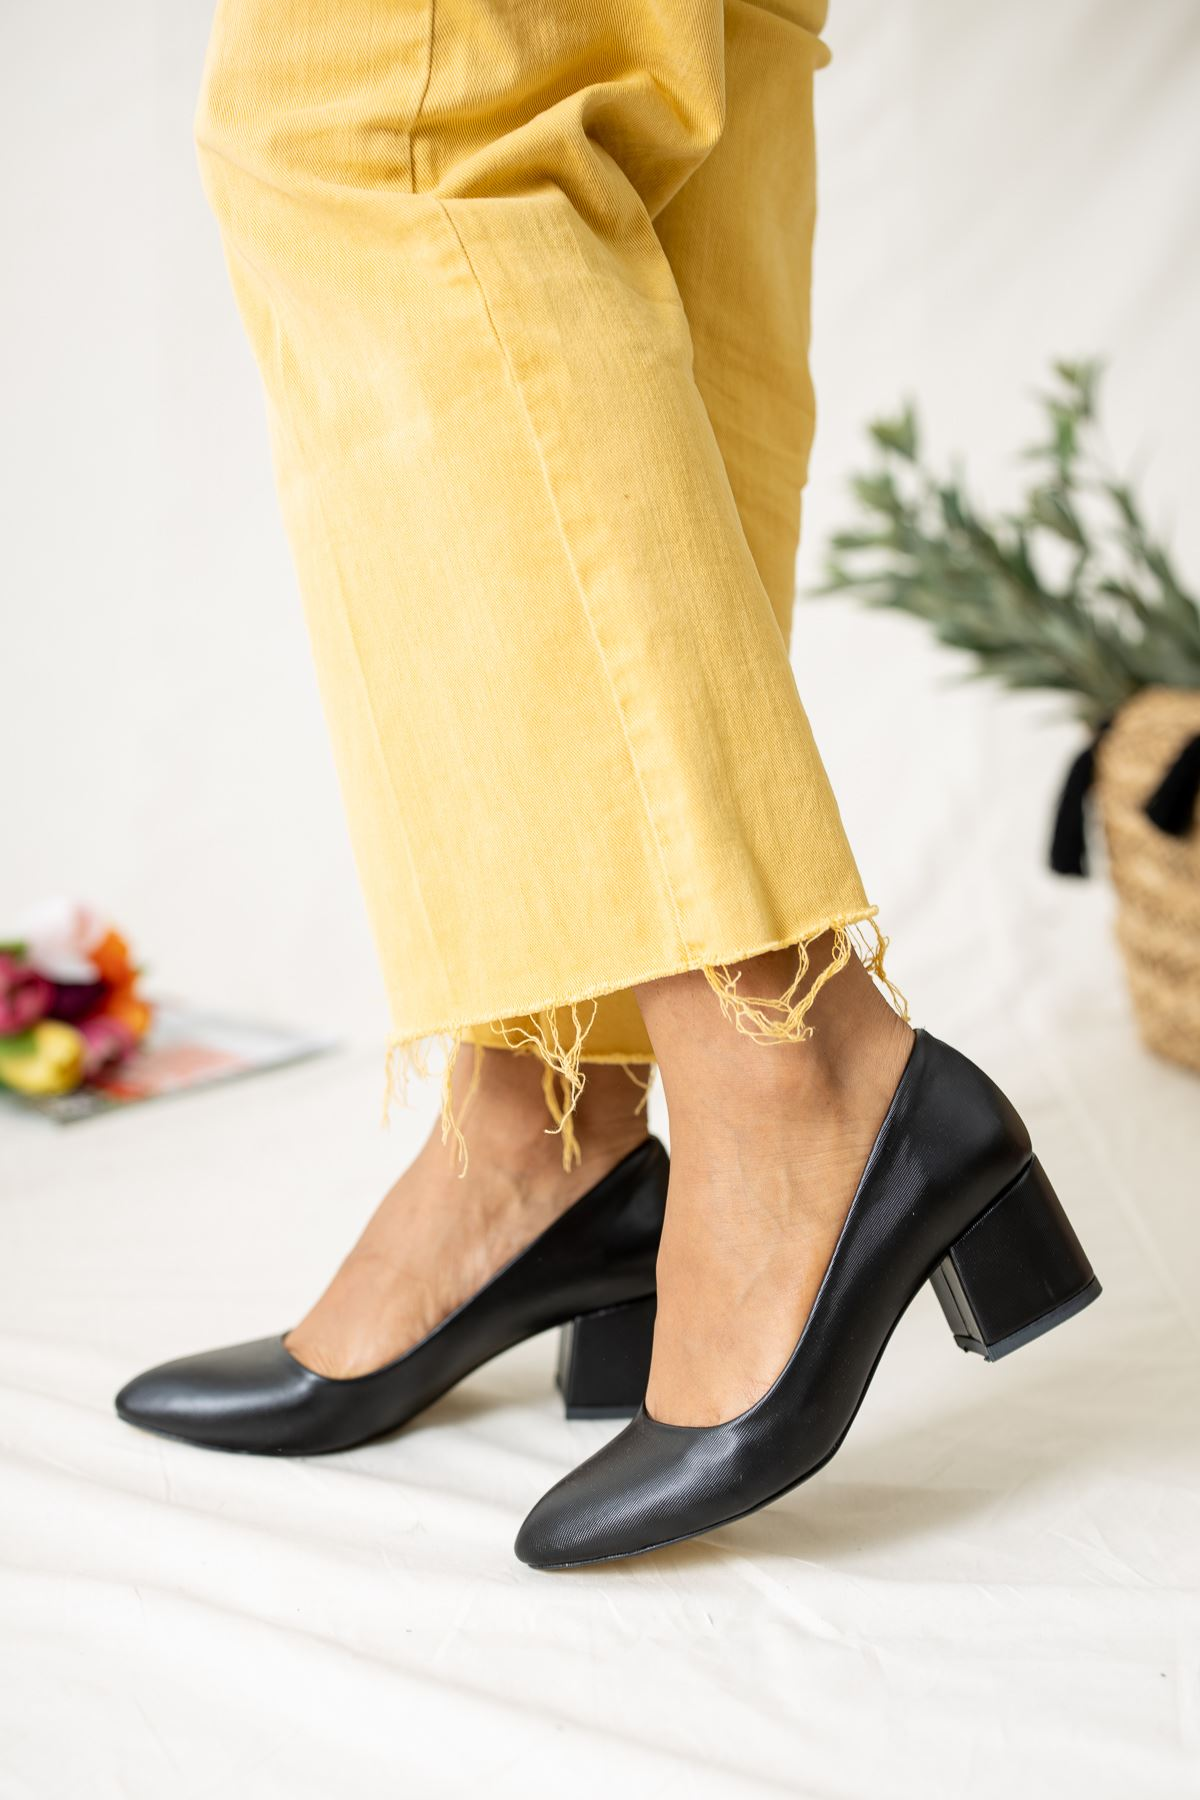 Sivri Burun Kare Topuk Siyah Diva Kadın Ayakkabı